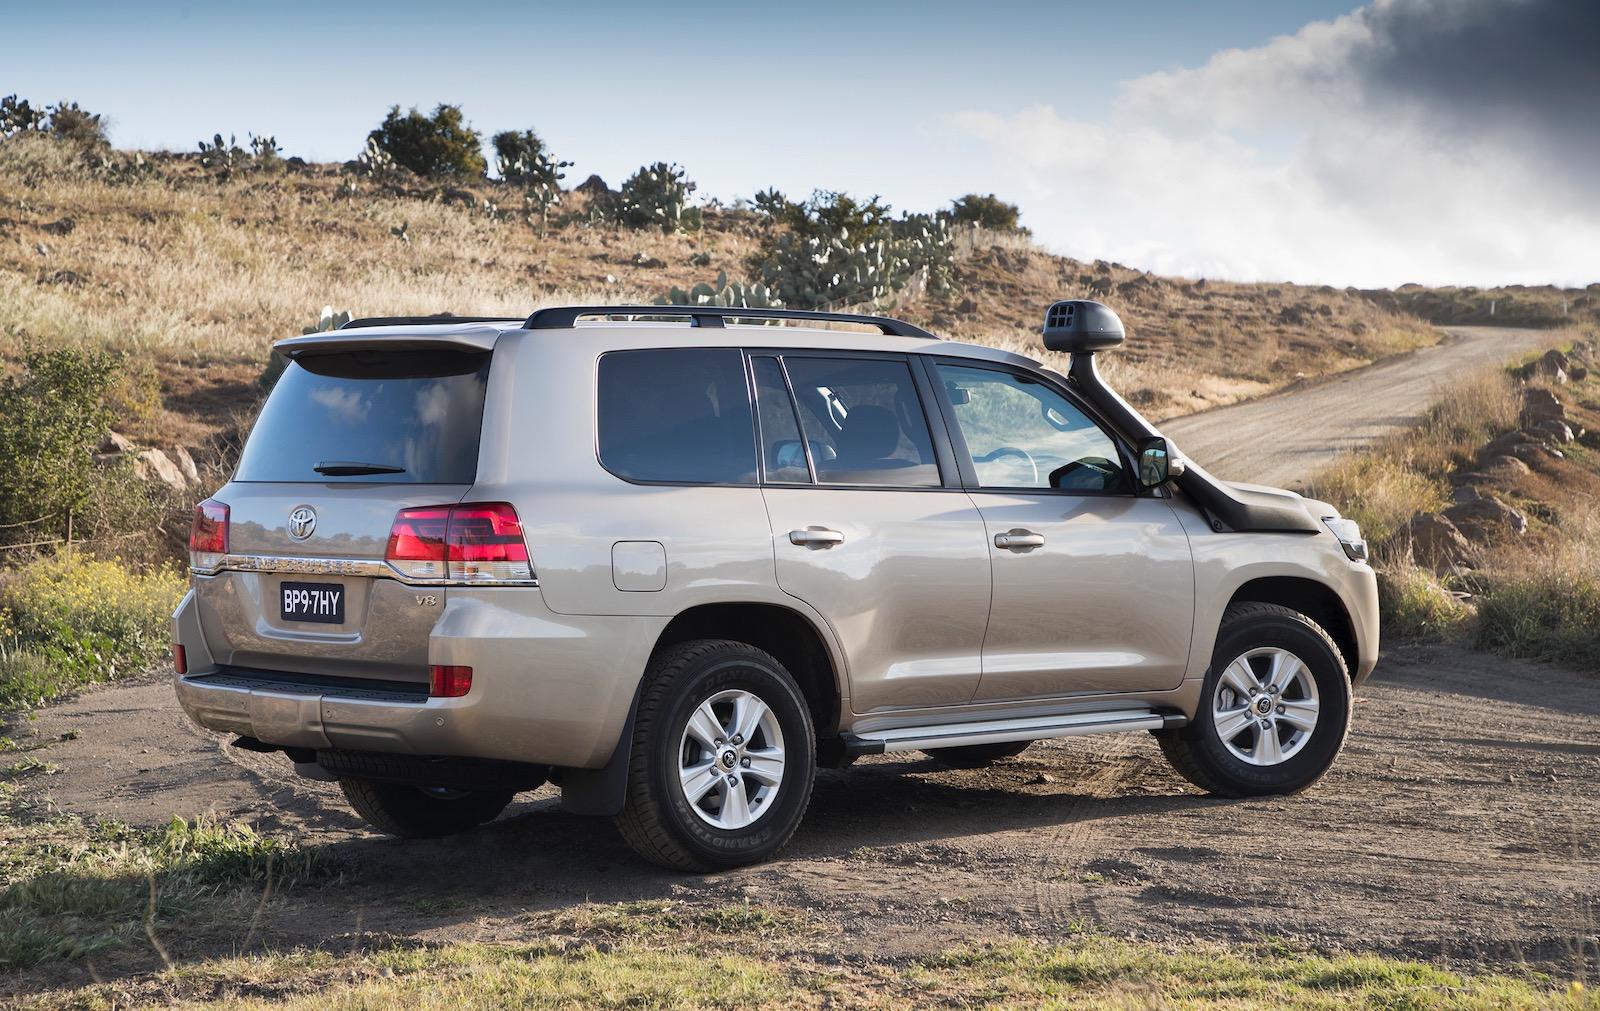 2019 Toyota Landcruiser 200 Series Updates Announced For